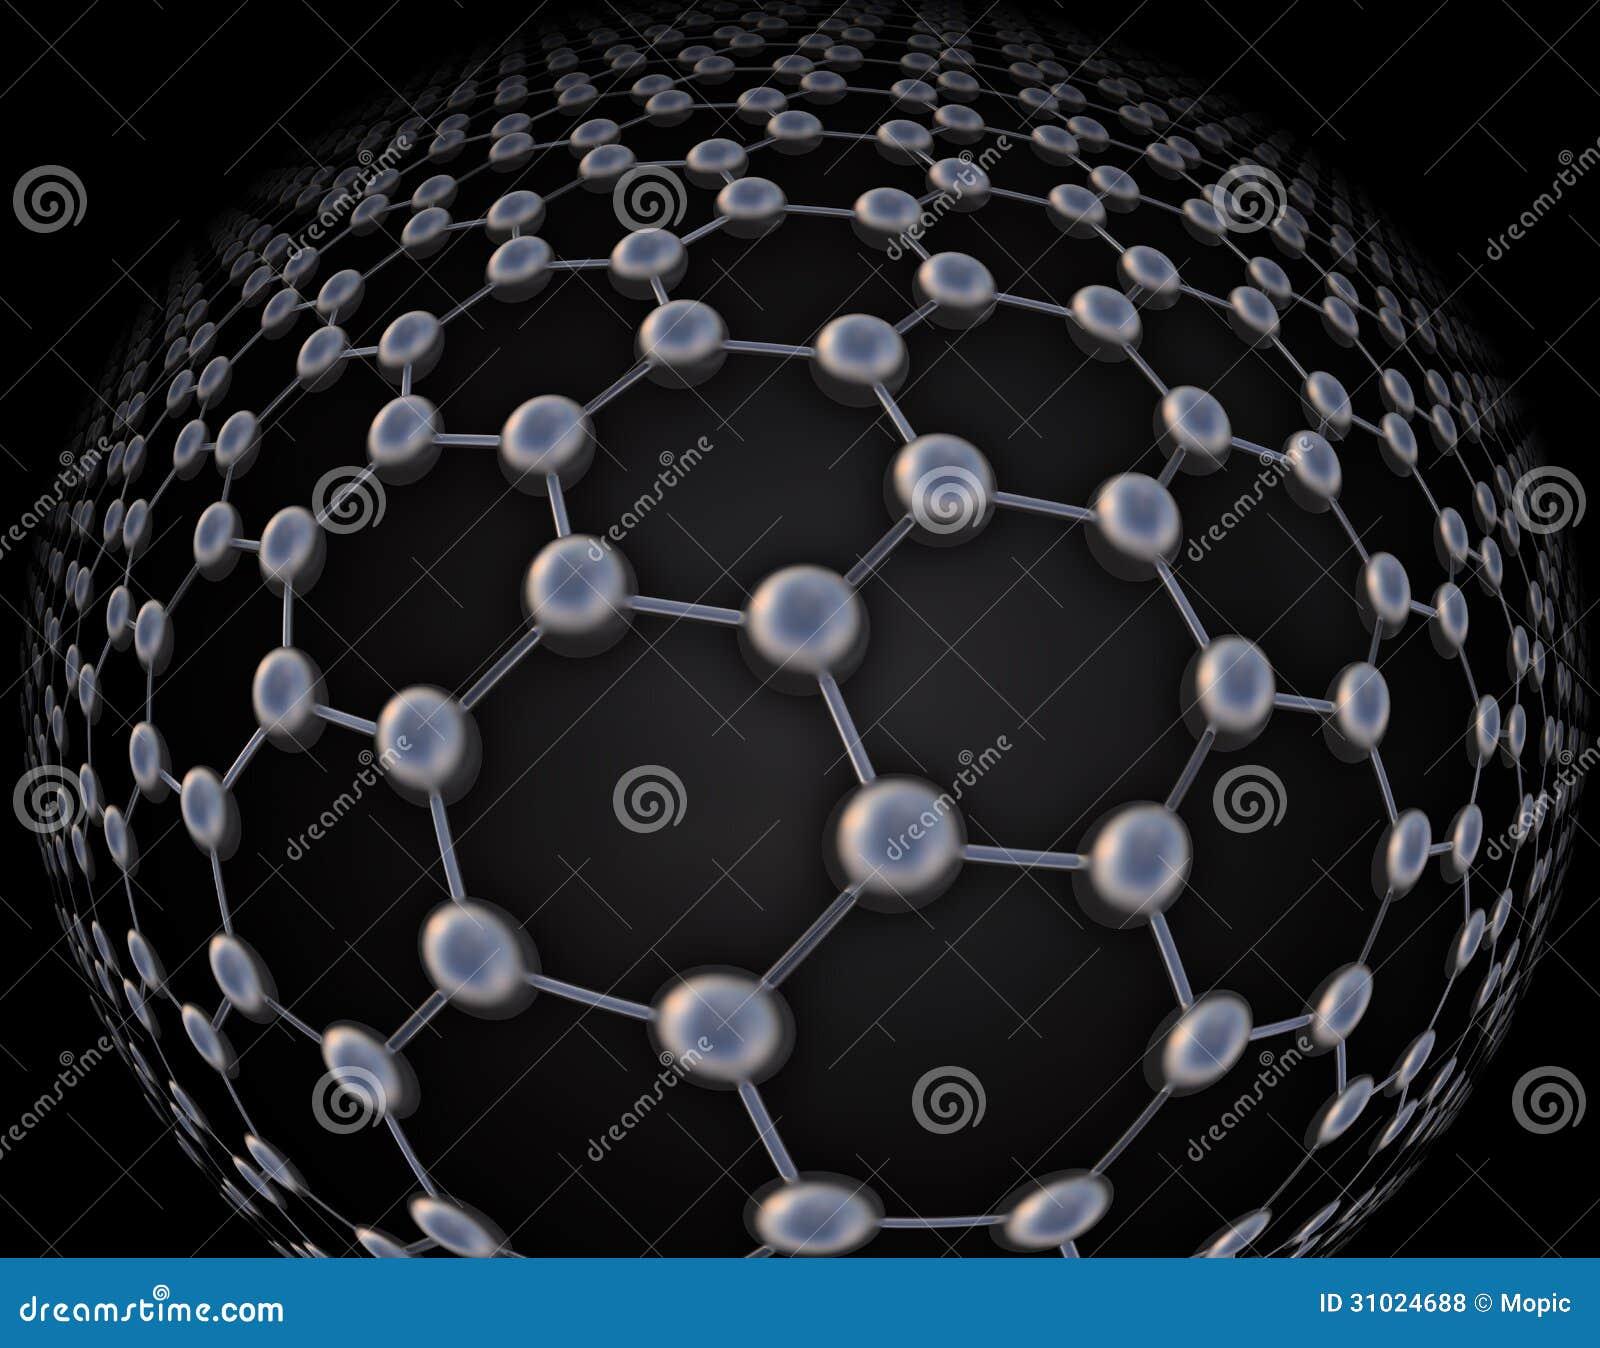 Graphene atomic structure stock illustration illustration of graphene atomic structure ccuart Images